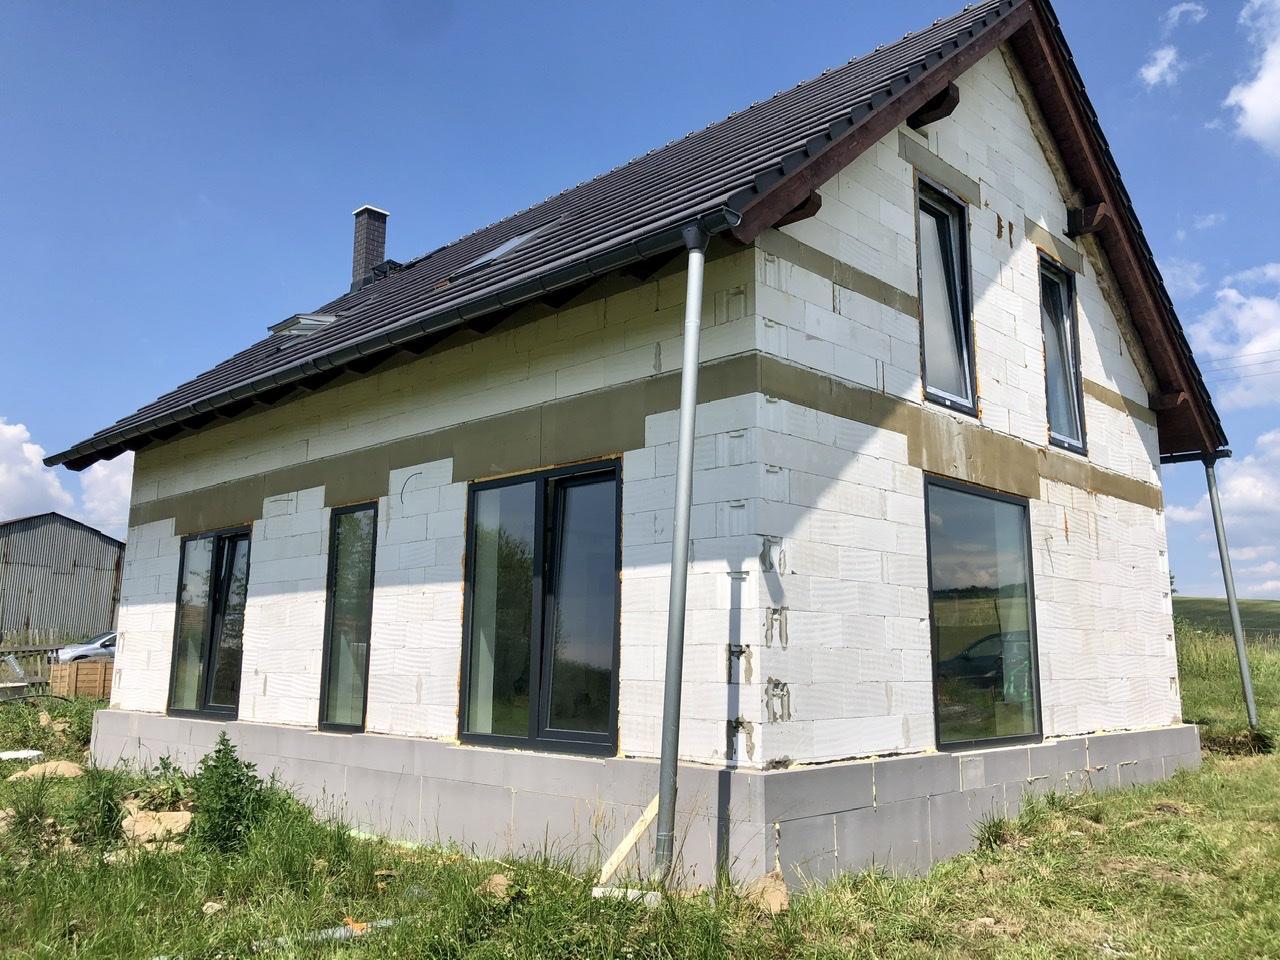 Dům u polí - stavba kolem a venku - Obrázek č. 4